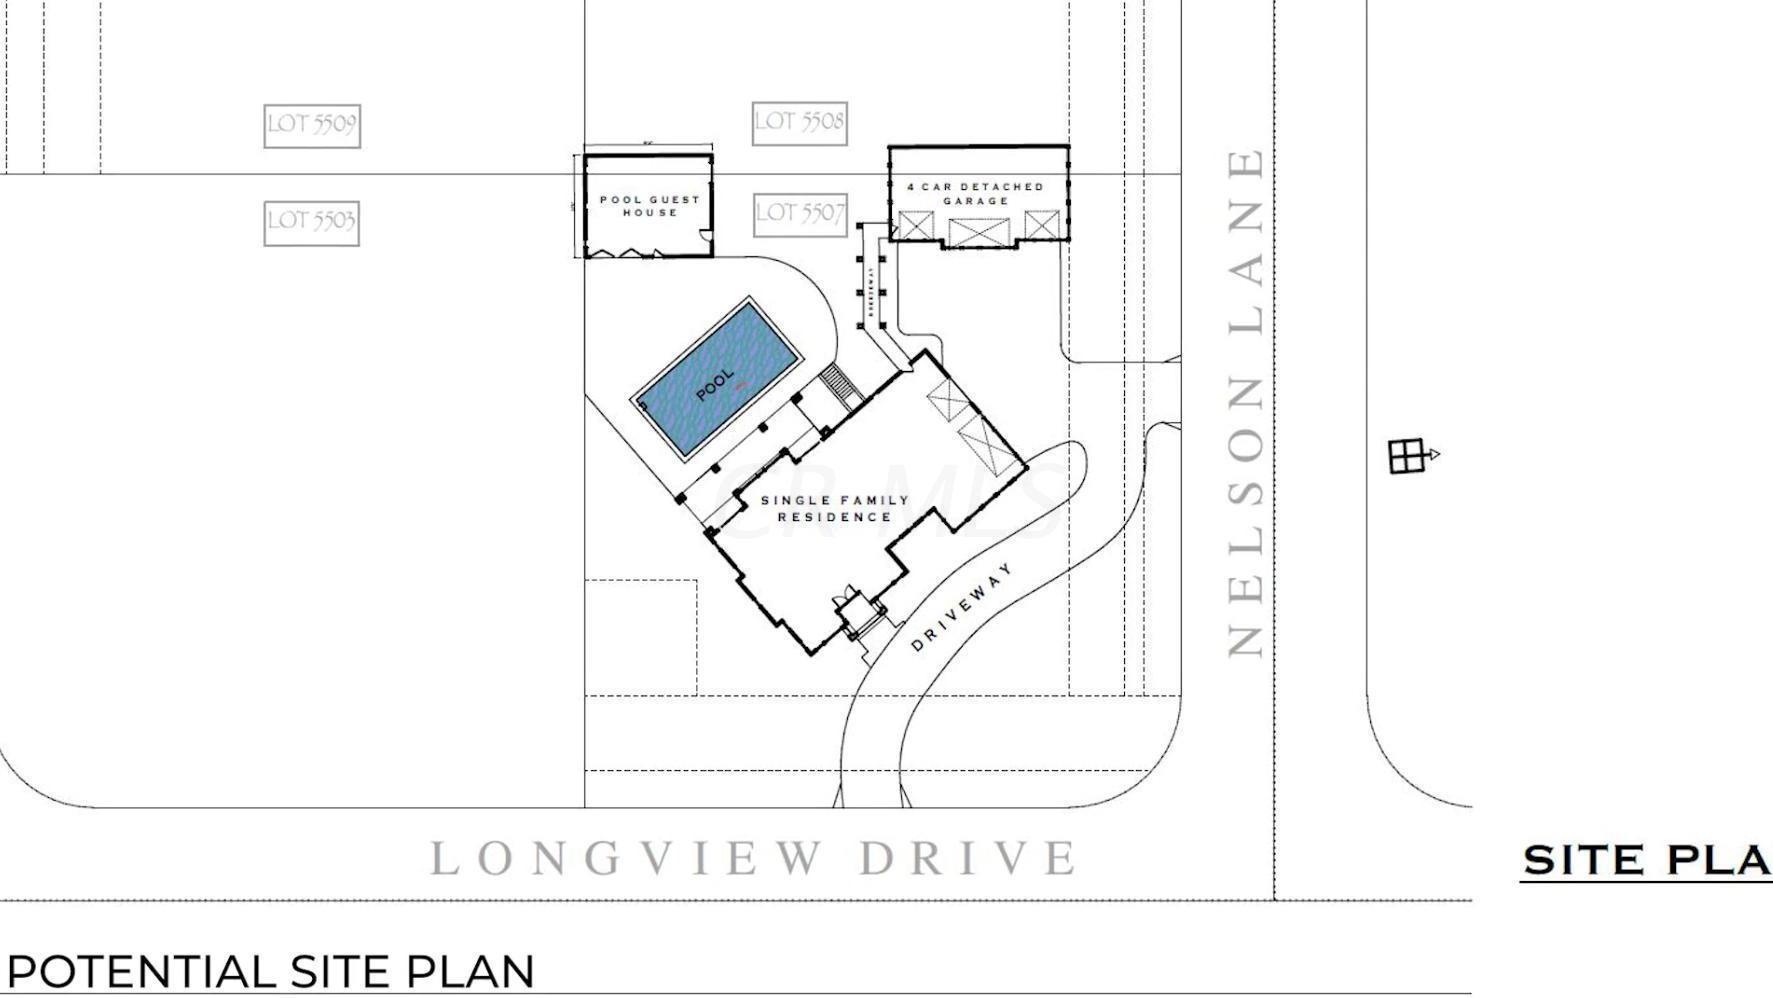 Potential Site Plan